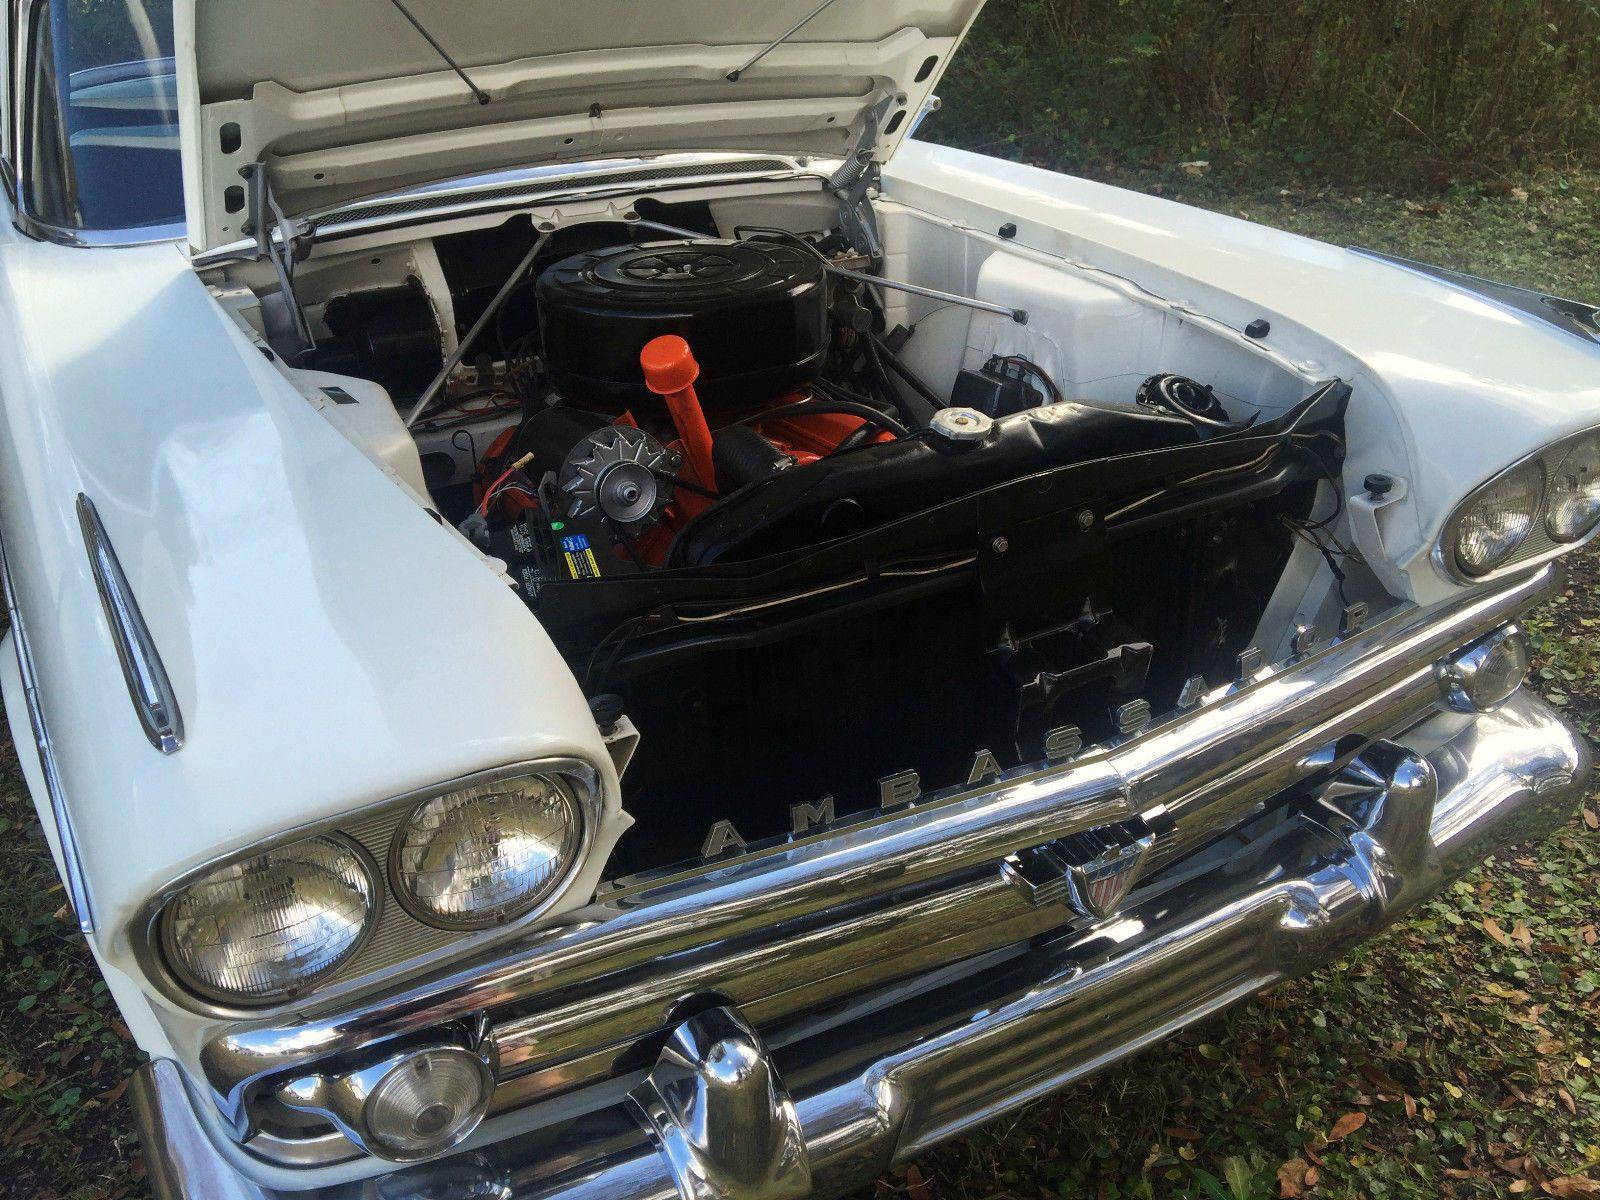 US $15,950.00 Used in eBay Motors, Cars & Trucks, AMC   RAMBLER ...